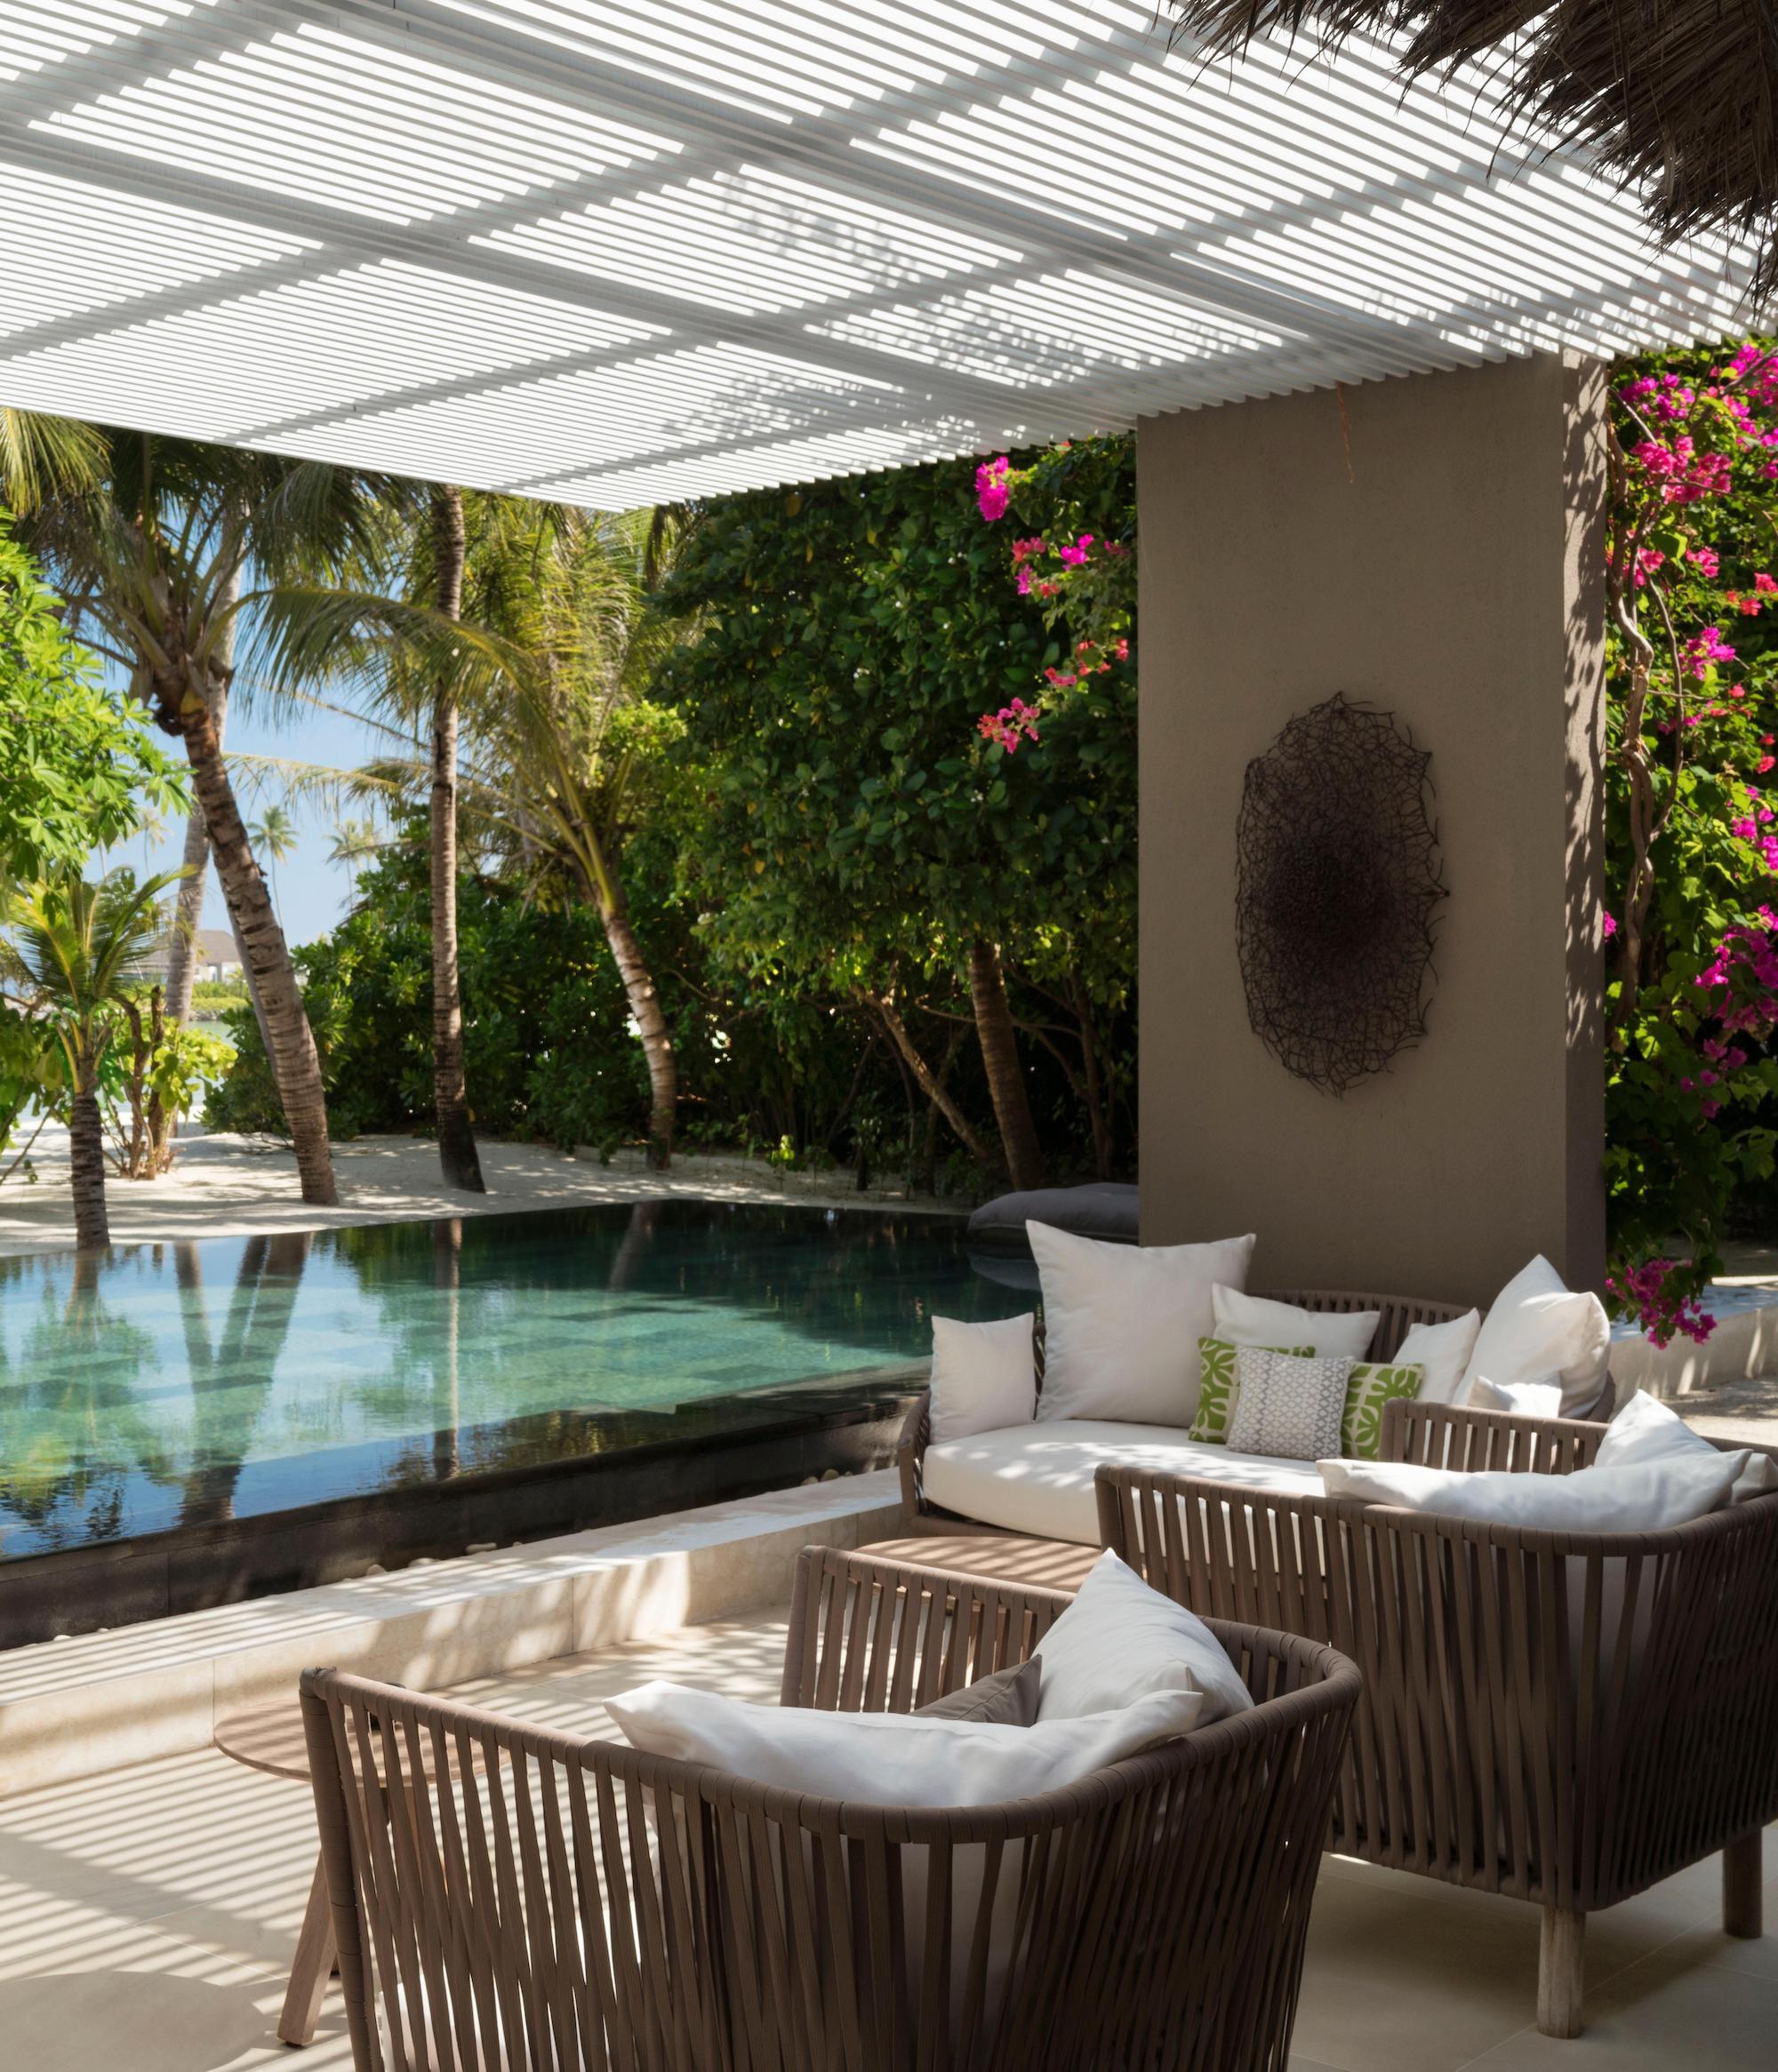 maldives hotel patio pool